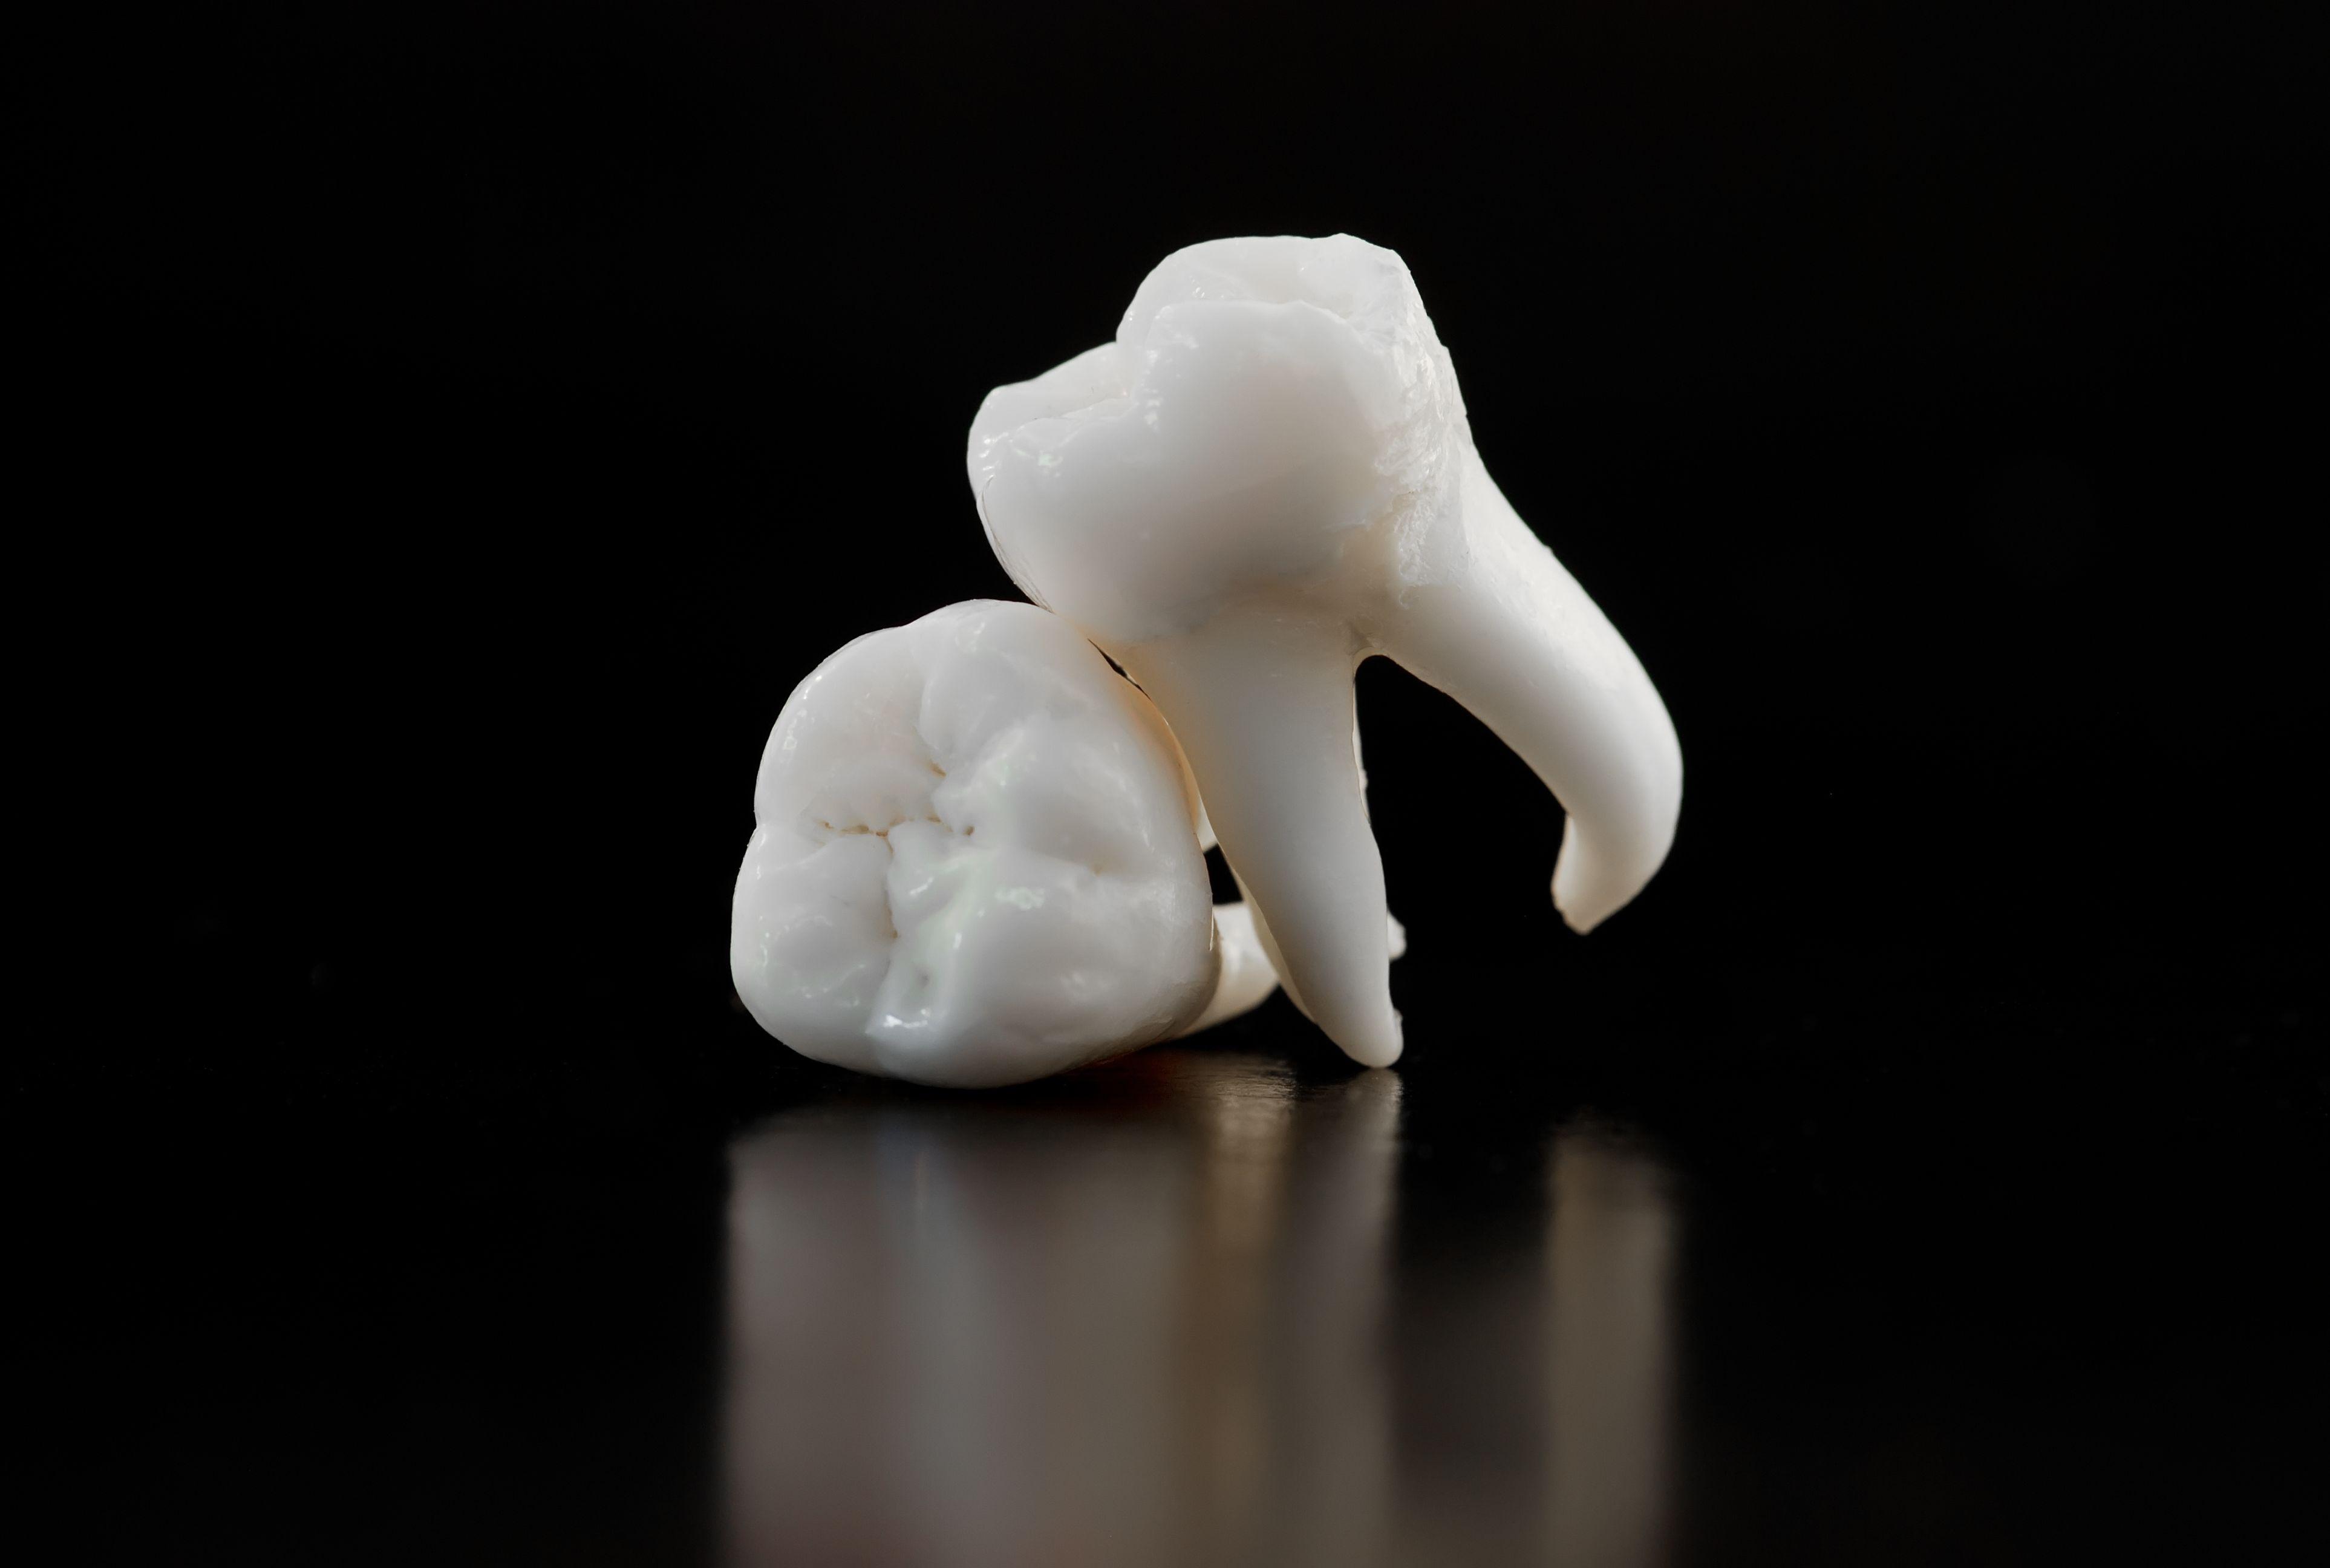 Удаленный зуб мудрости